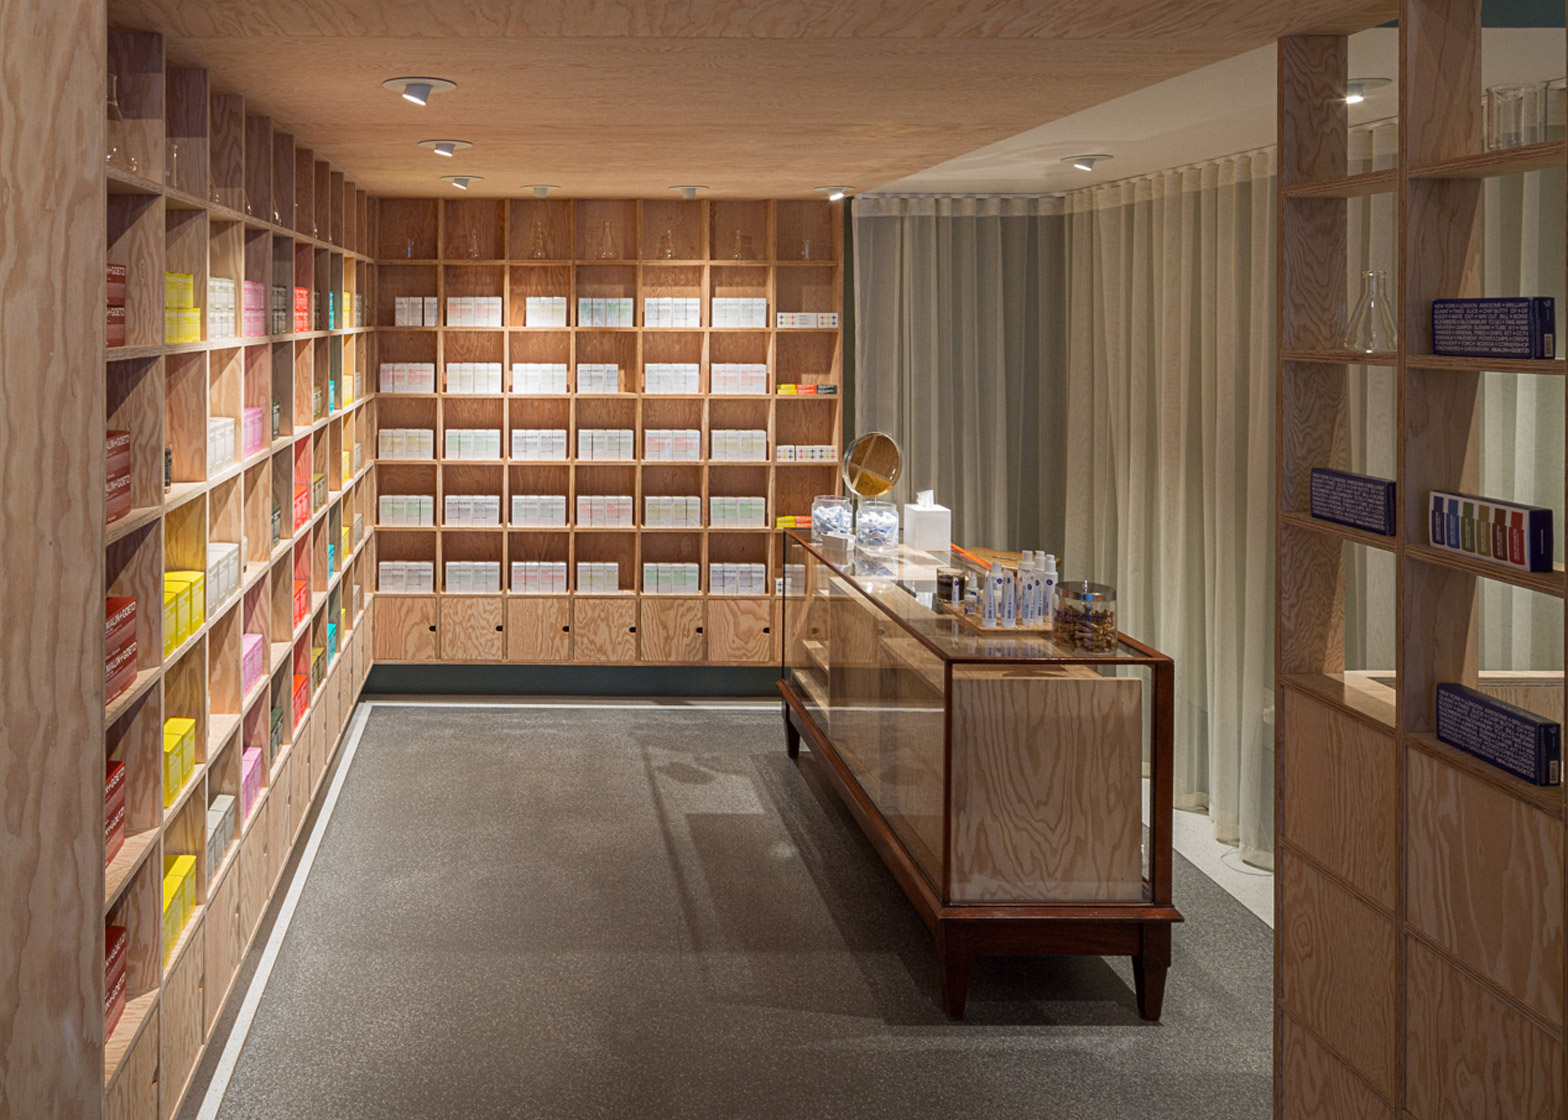 malingoetz-apothecary-shops-jonathan-tuckey-interior-london_dezeen_1568_4